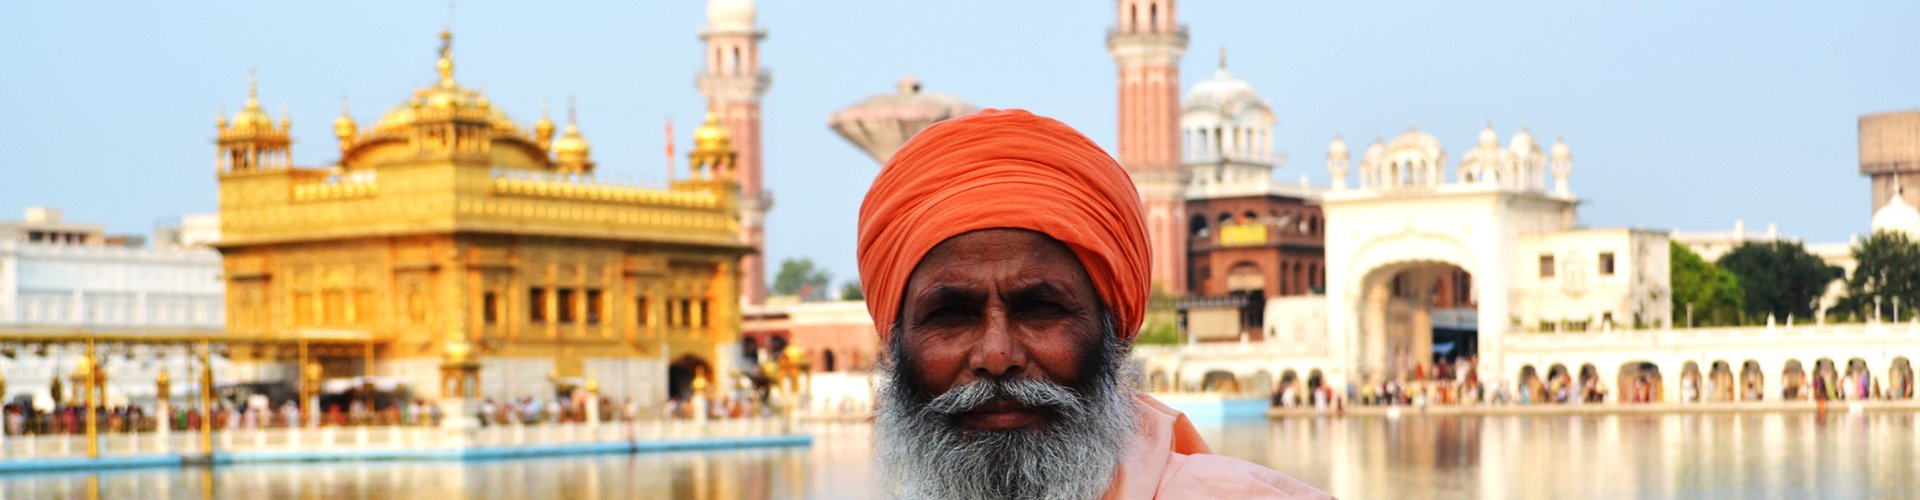 Gouden Tempel van Amritsarl in Punjab, India